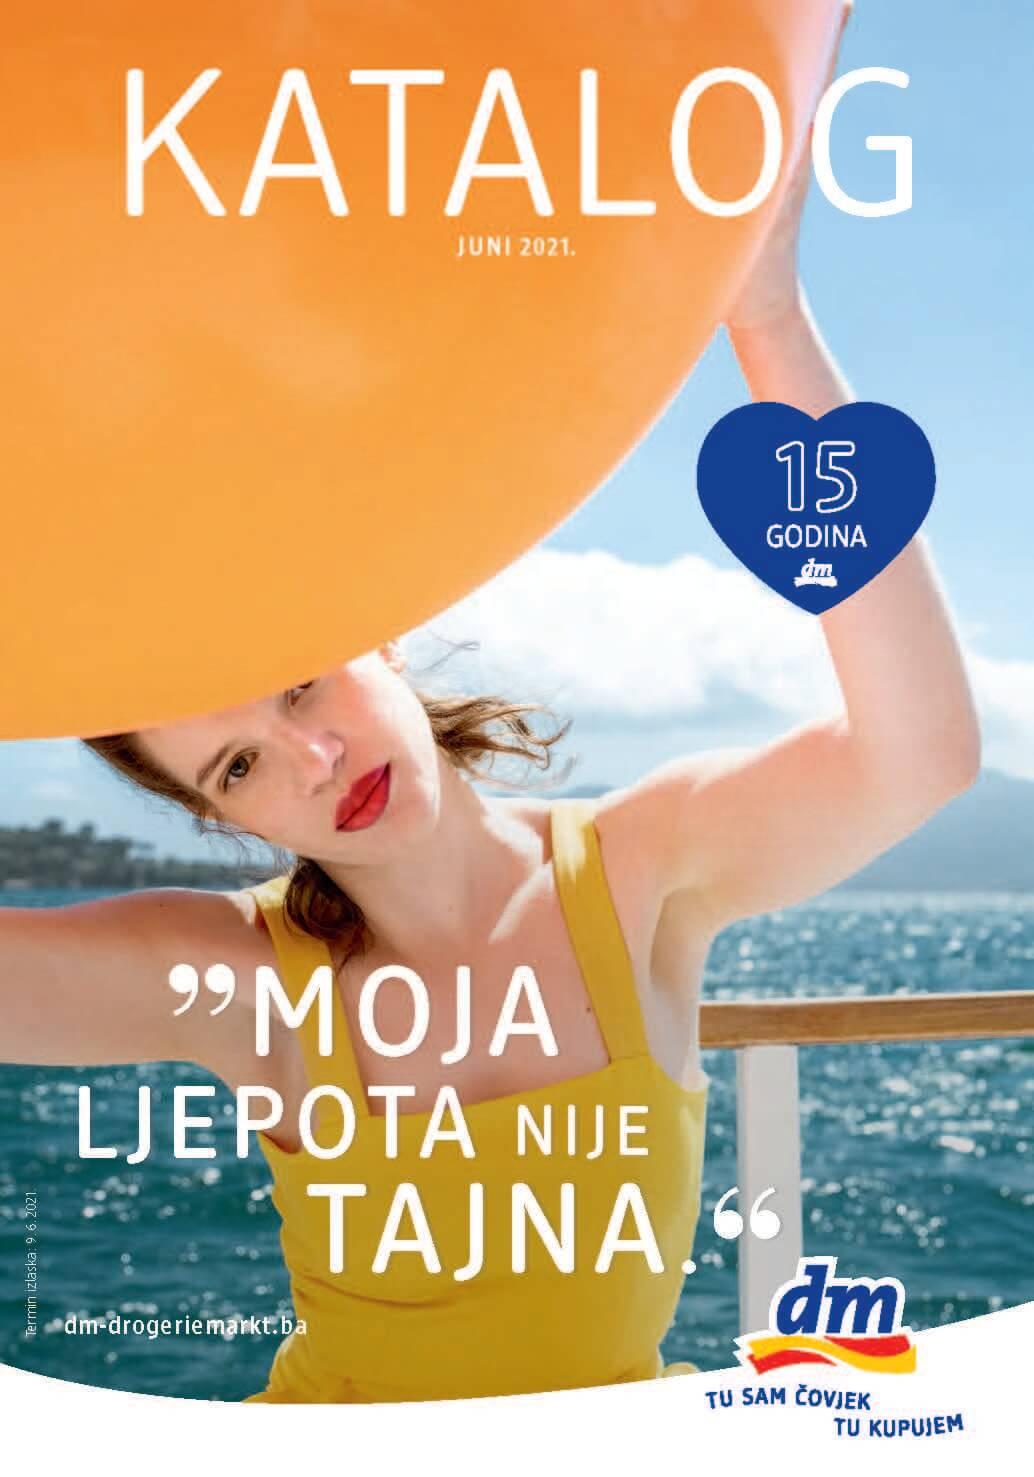 DM Katalog BiH JUN 2021 09.06. 22.06. eKatalozi.com PR Page 01